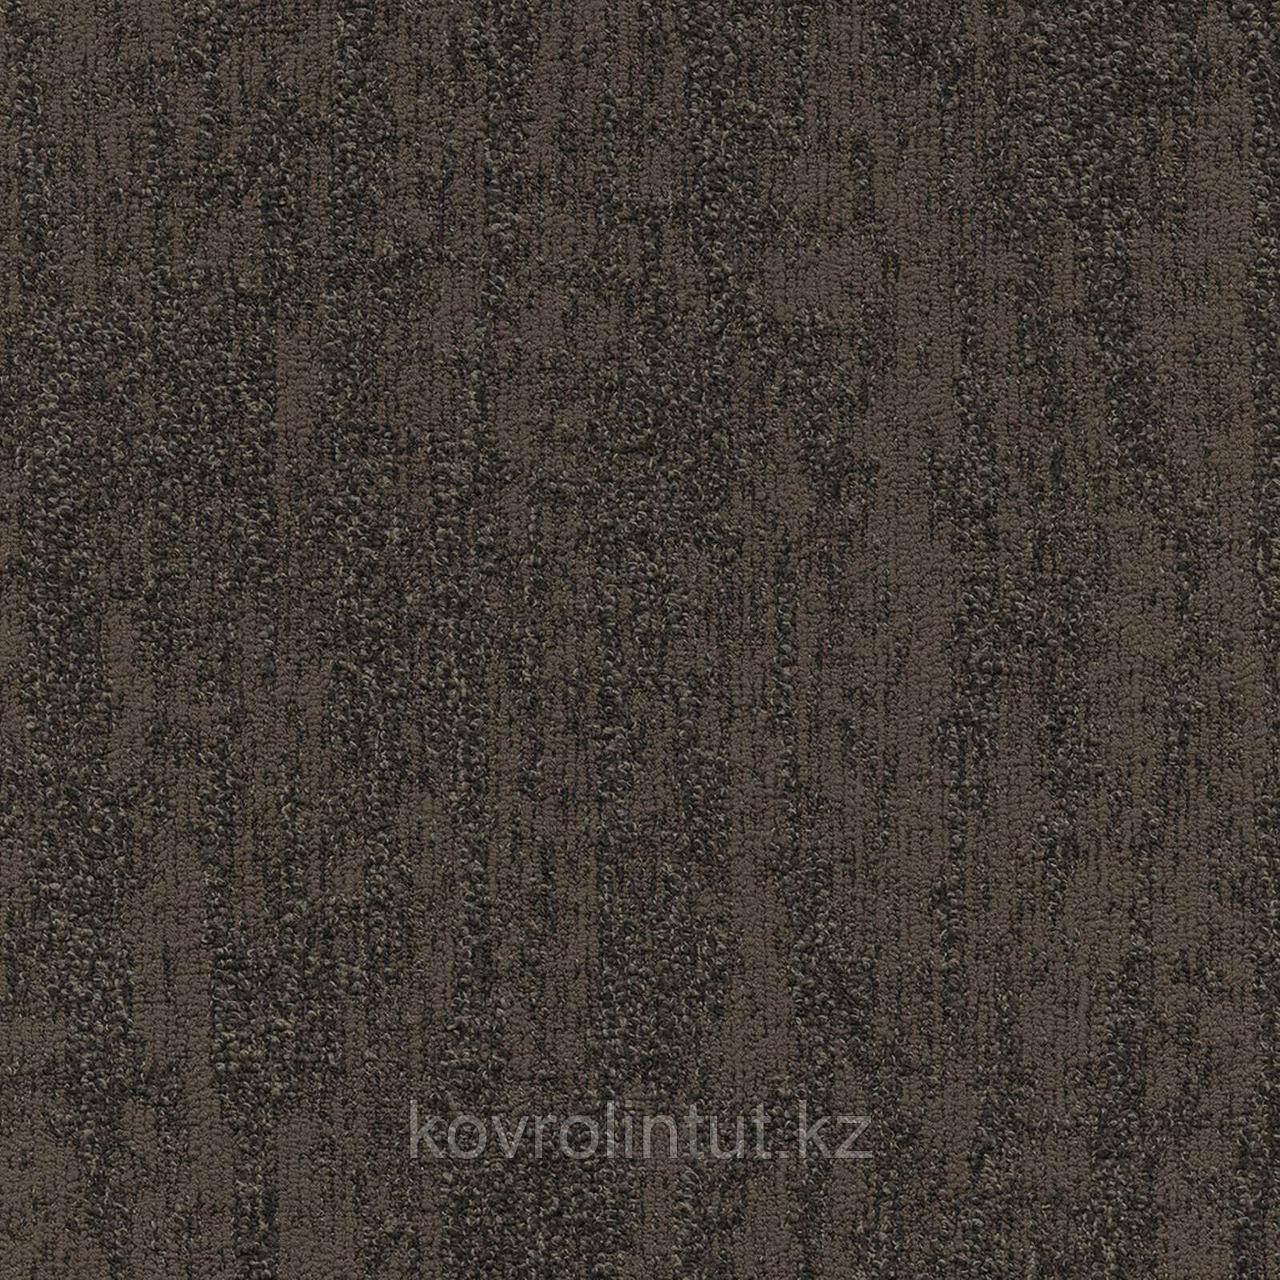 Плитка ковровая Modulyss Willow 668, 100% PA